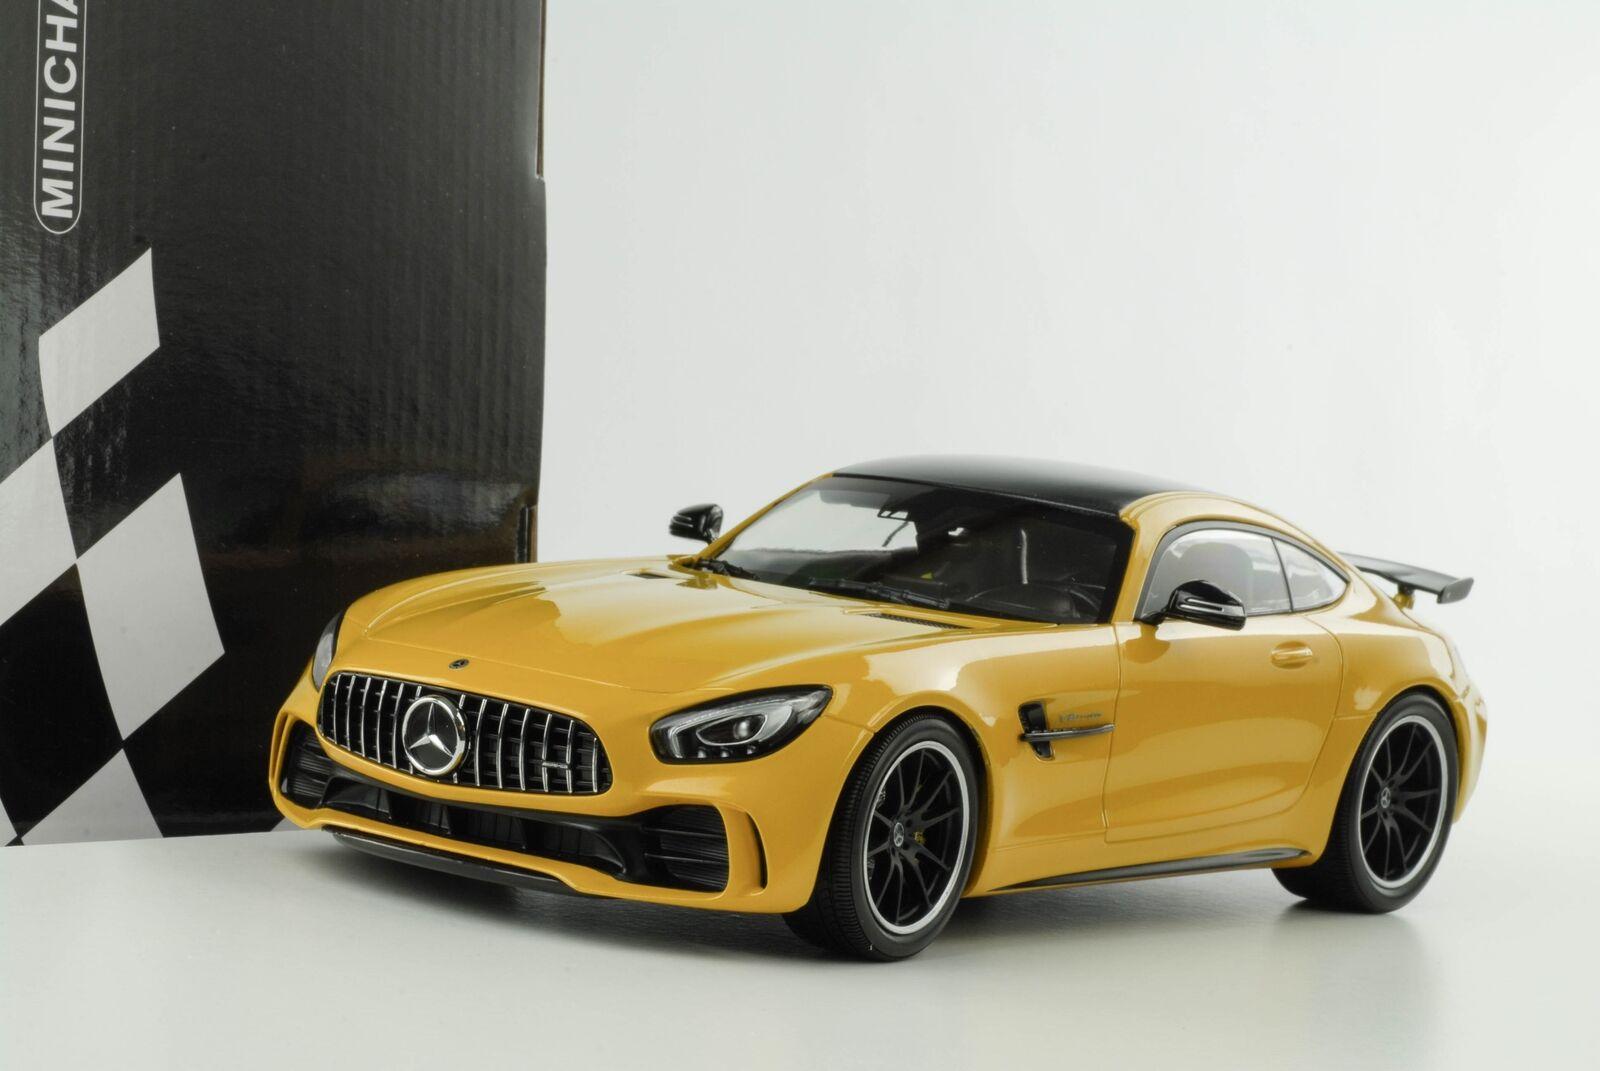 1 18 Mercedes-Benz AMG GT-R v8 BI TURBO 2017 GIALLO METALLIZZATO DIECAST MINICHAMPS